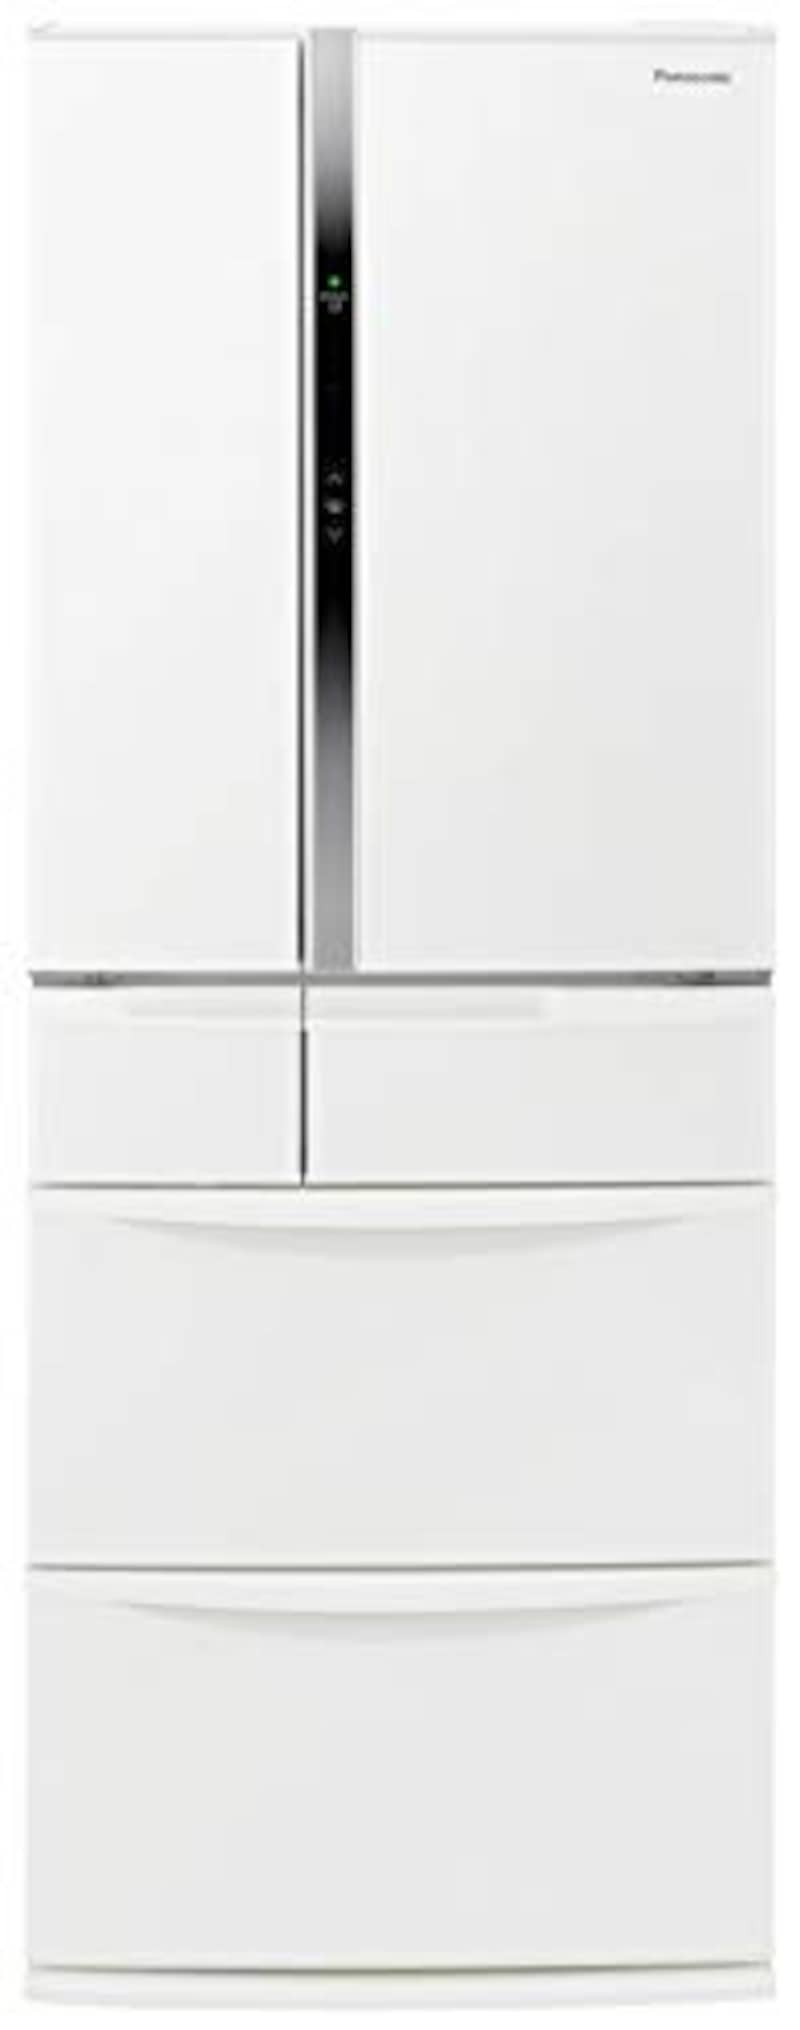 Panasonic(パナソニック),6ドア 冷蔵庫 451L,NR-FVF456-W